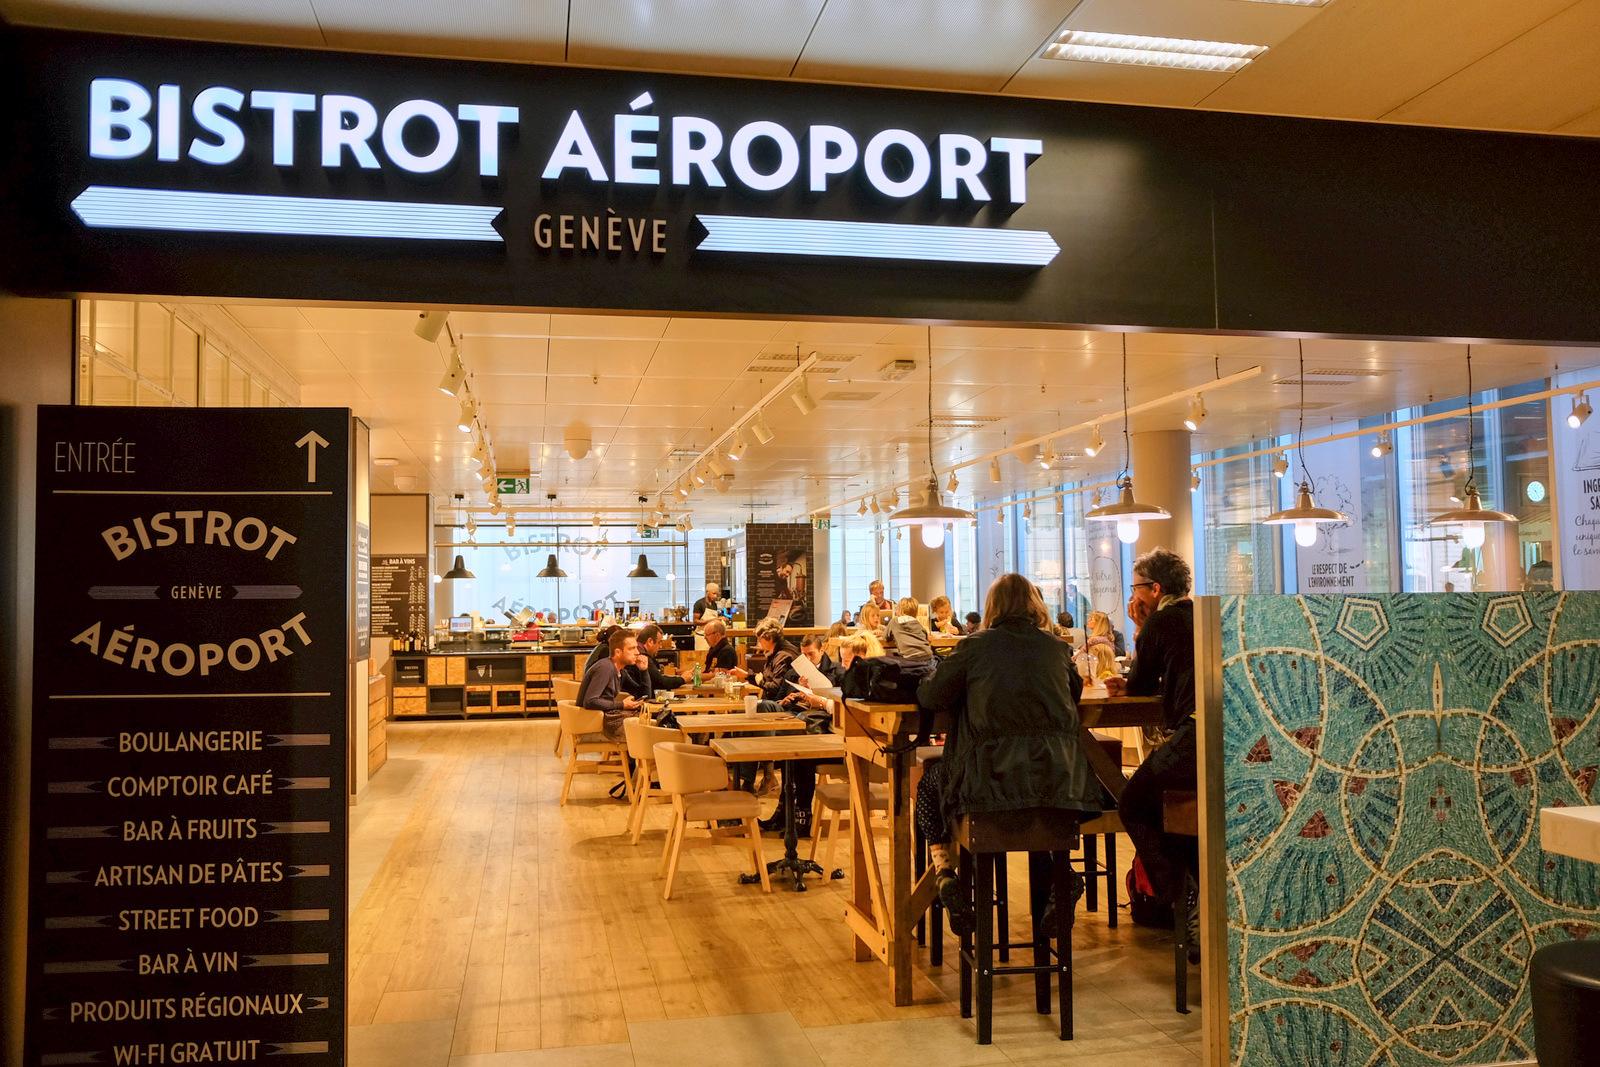 Bistrot Geneve @ Geneva Airport, Seafood Bar @ Oslo Airport & Obwarzanki @ Krakow Airport